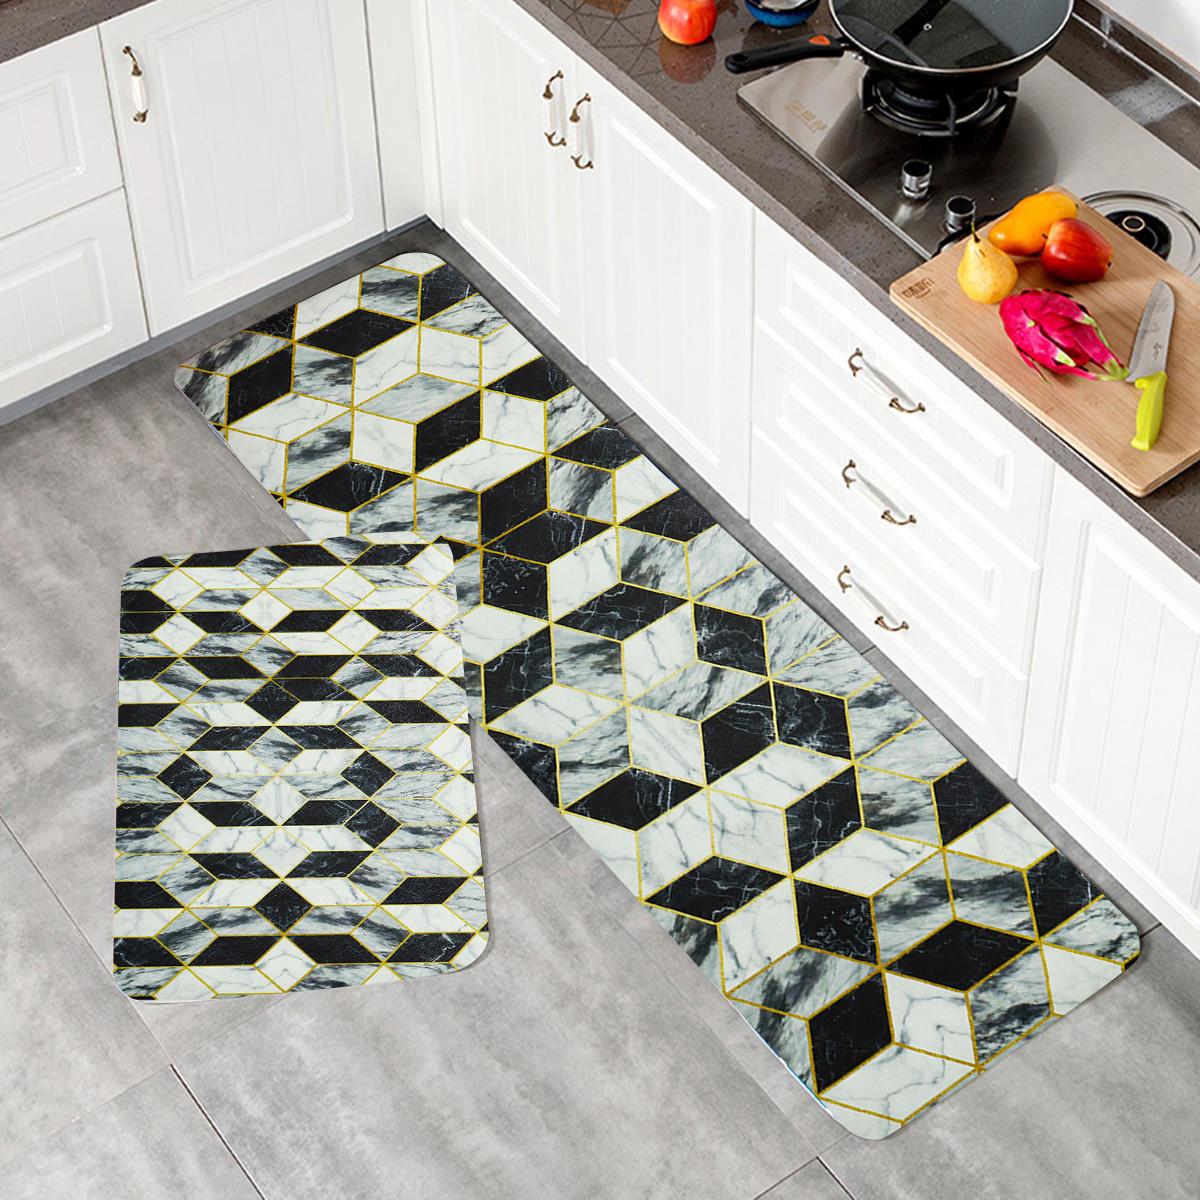 Non Slip Kitchen Floor Mat Washable Rug Home Door Bathroom Runner Carpet 75 180cm Sale Banggood Com